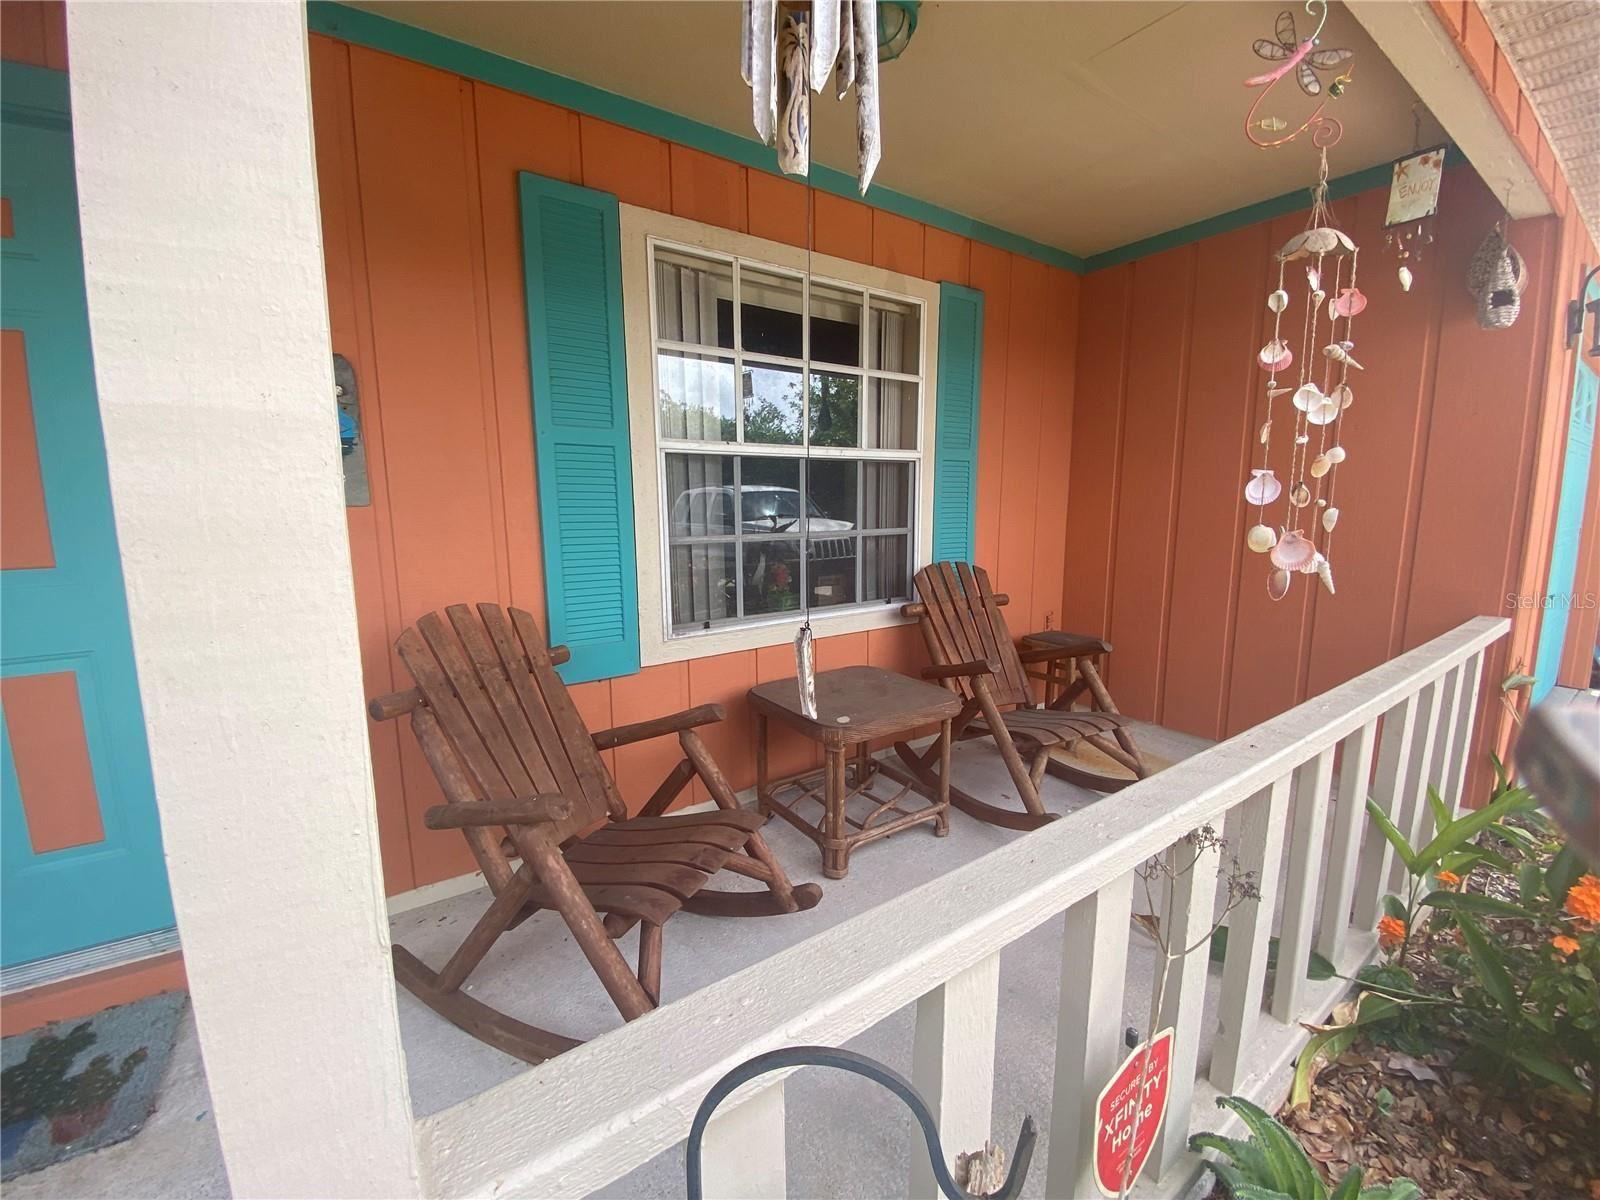 Photo of 11137 WATERFORD AVENUE, ENGLEWOOD, FL 34224 (MLS # D6119243)